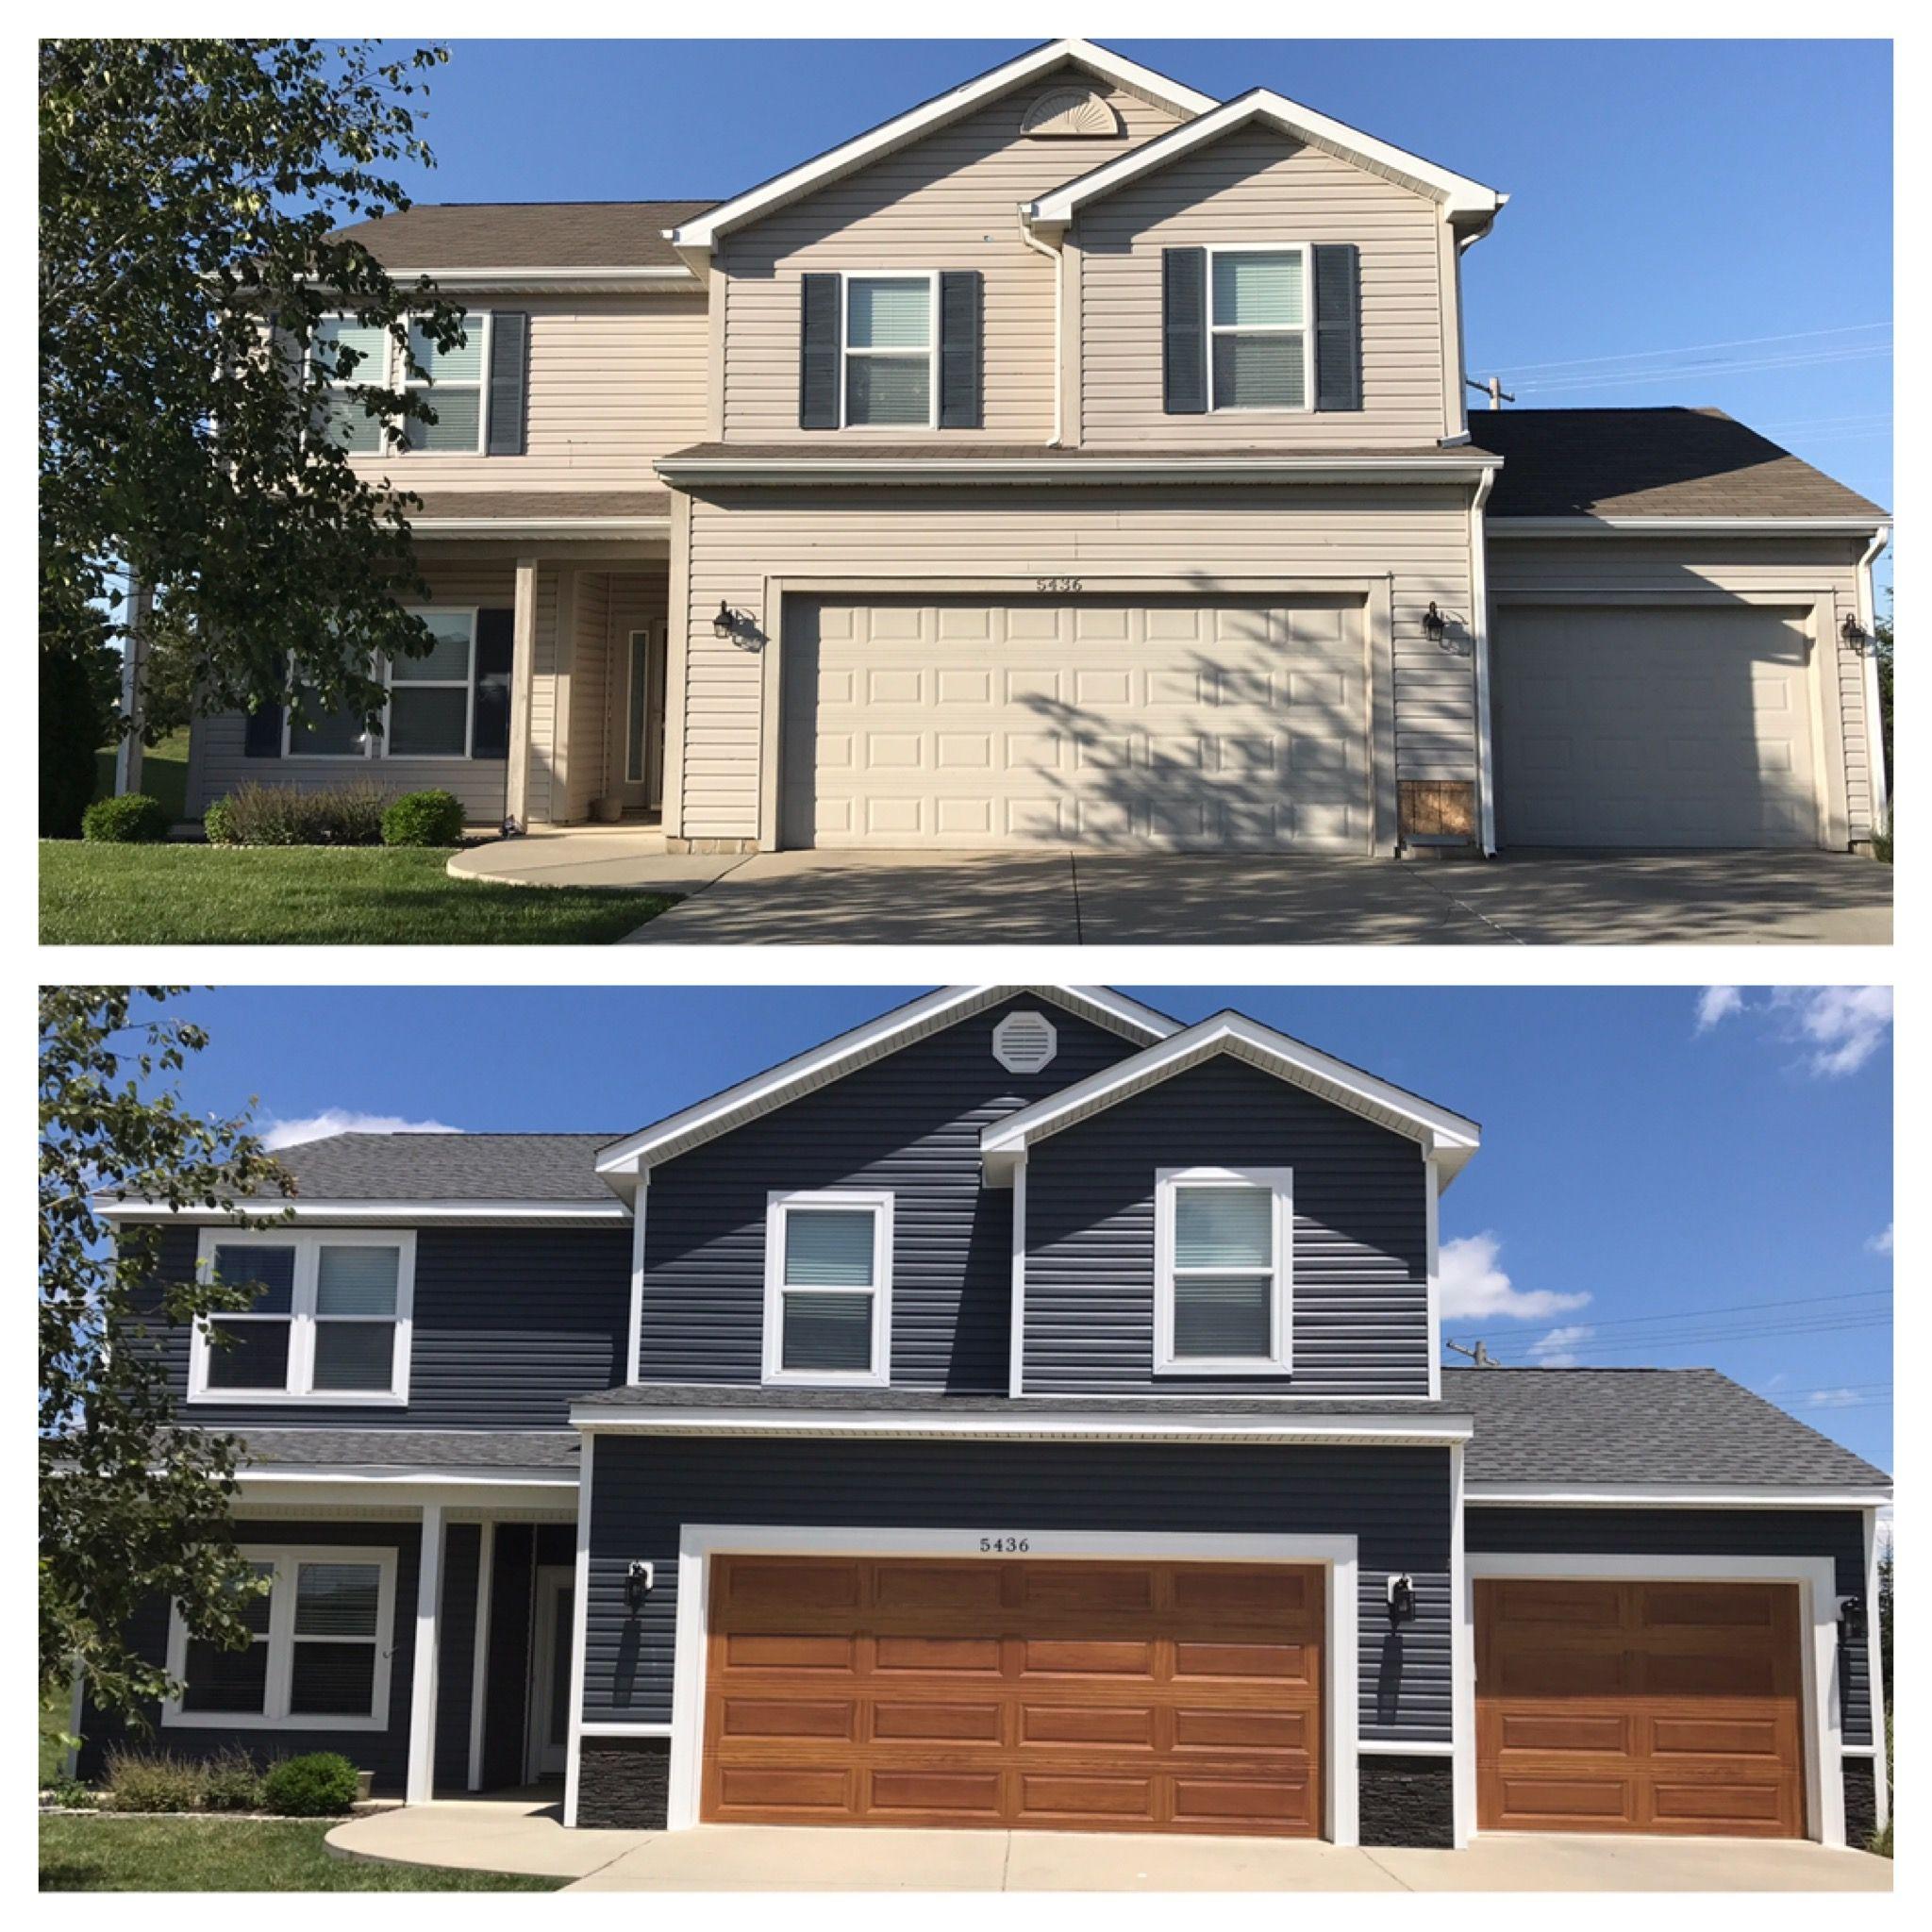 Hail Damage House Transformation Crane Slate Siding Chi Accents Cedar Garage Doors House Exterior Blue Exterior Paint Colors For House Brown Garage Door